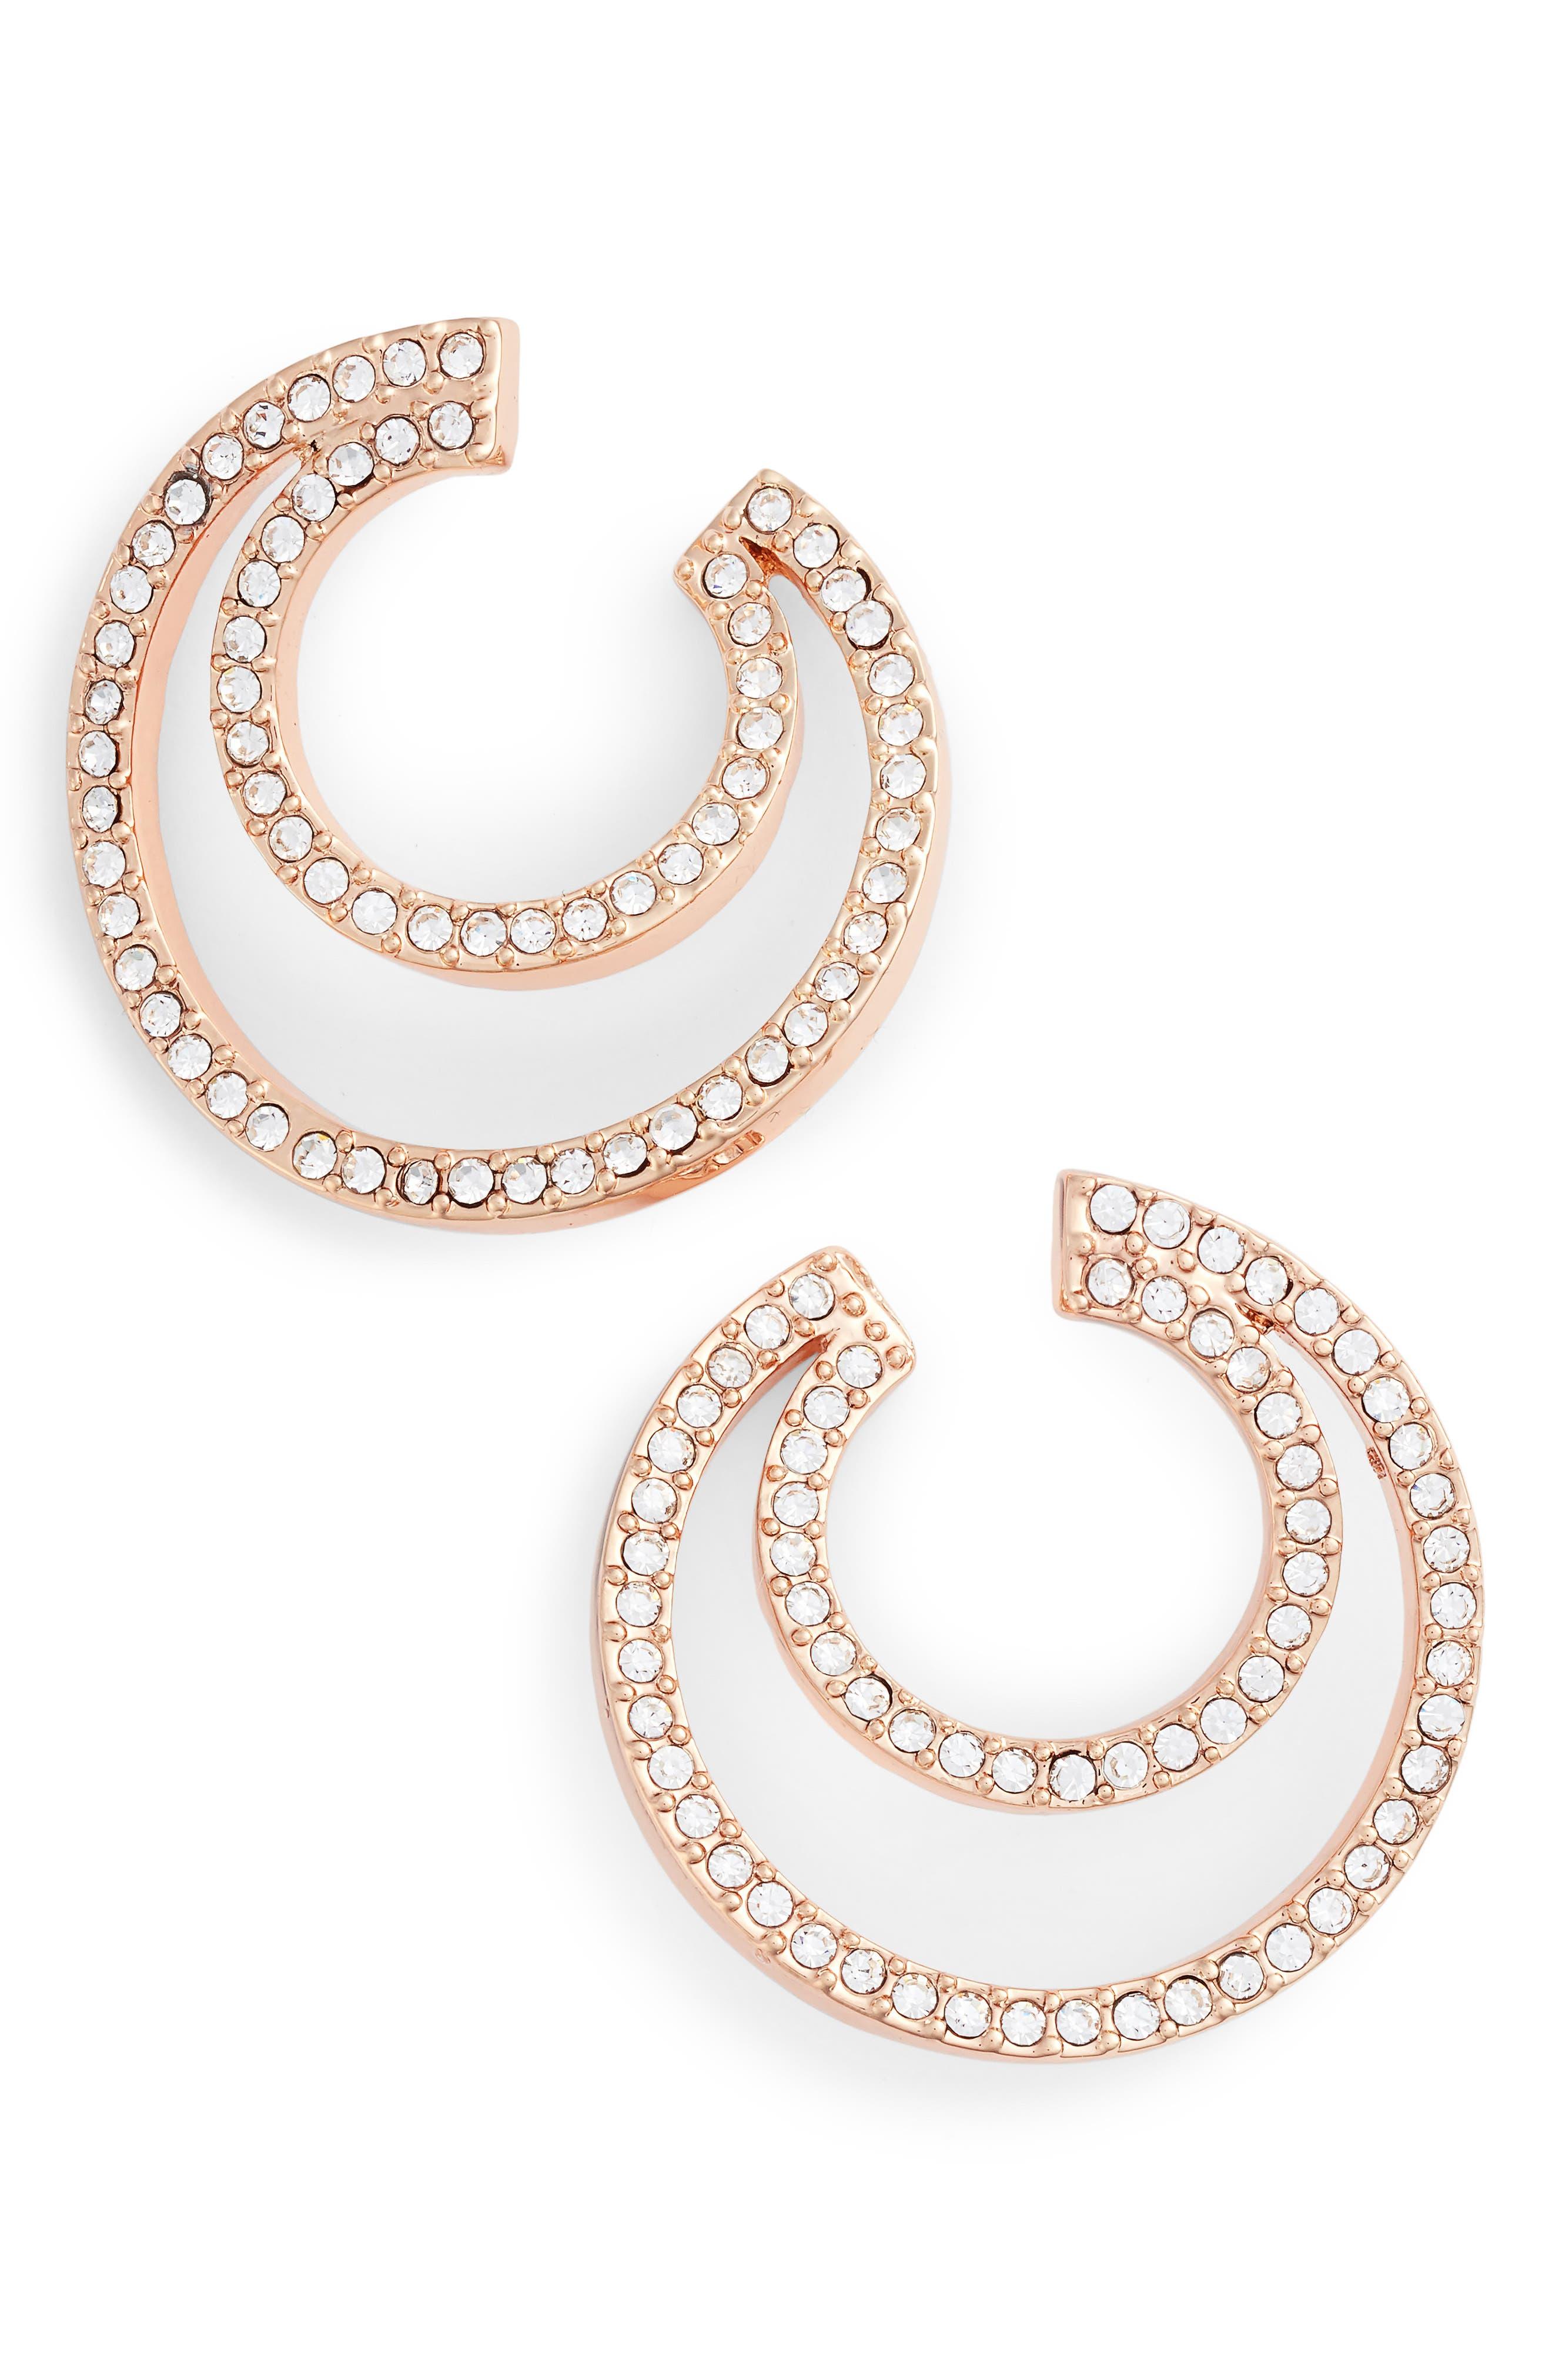 Curved Hoop Earrings,                         Main,                         color, Rose Gold